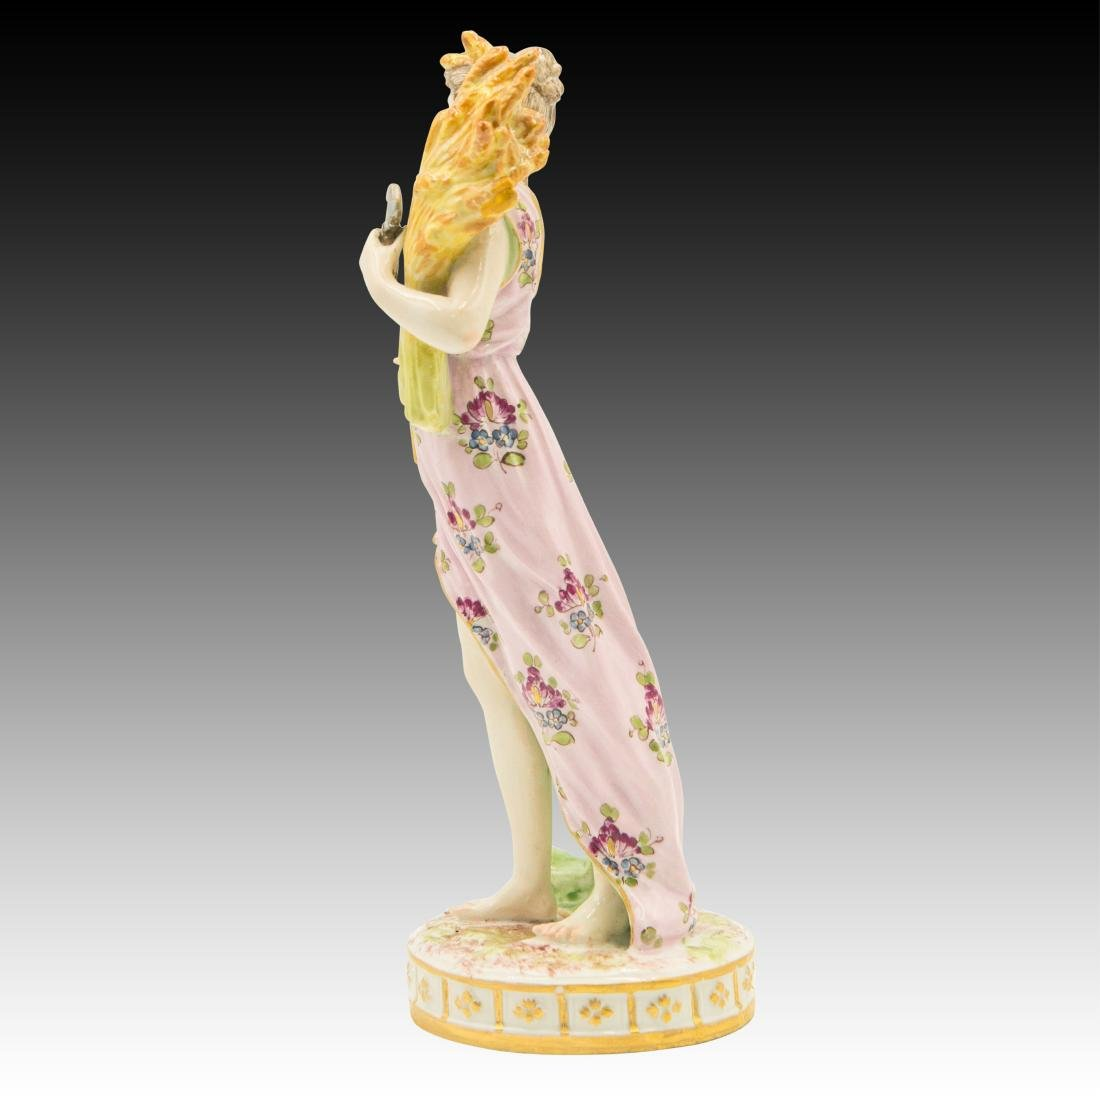 Meissen semi-nude Woman With Wheat Figurine - 2